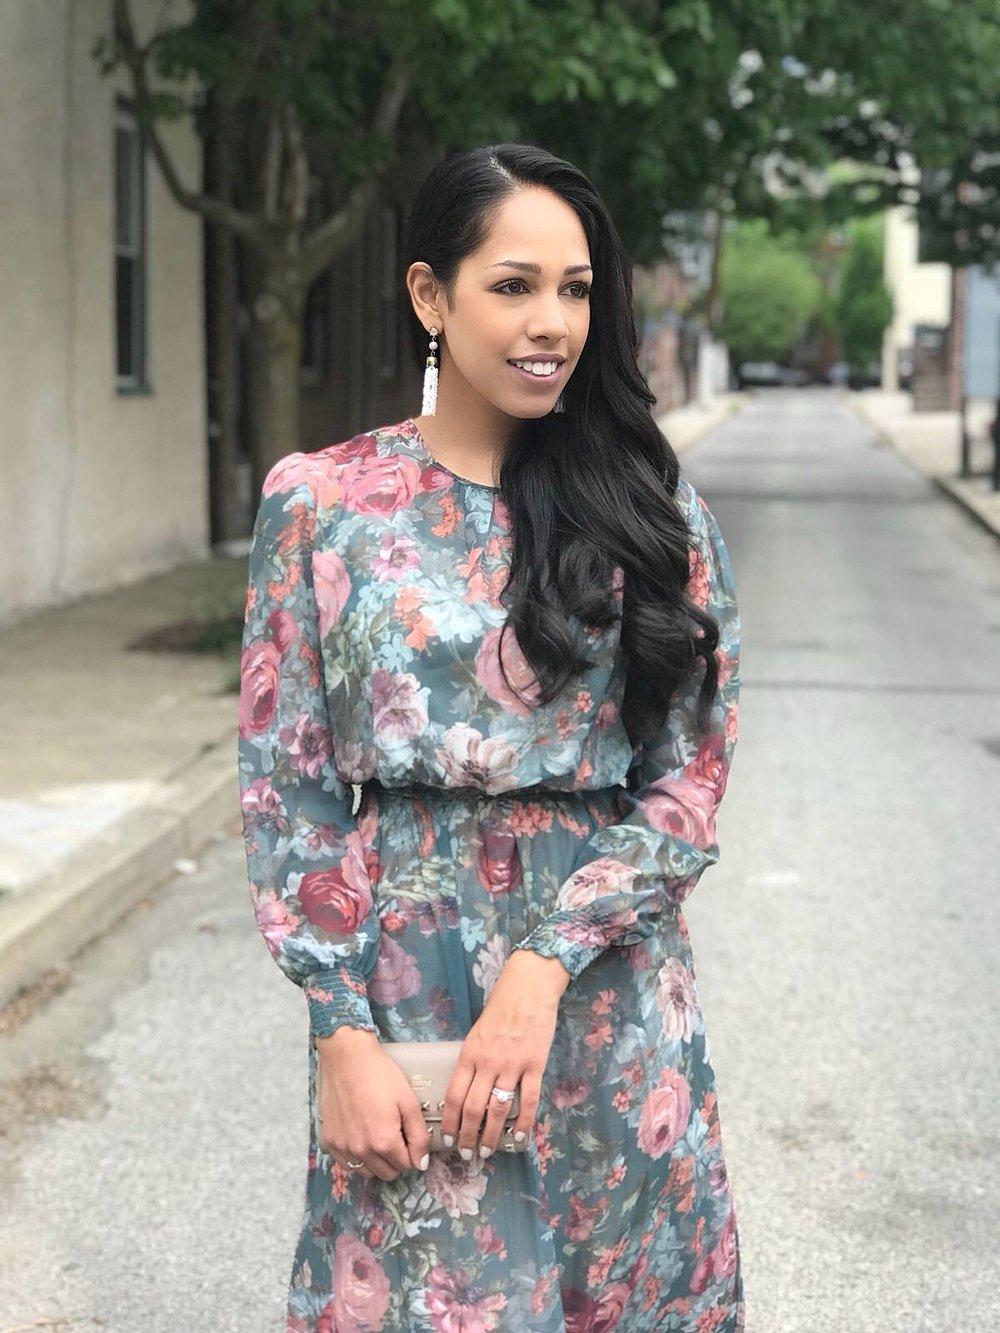 shein-spring-floral-midi-dress.JPG